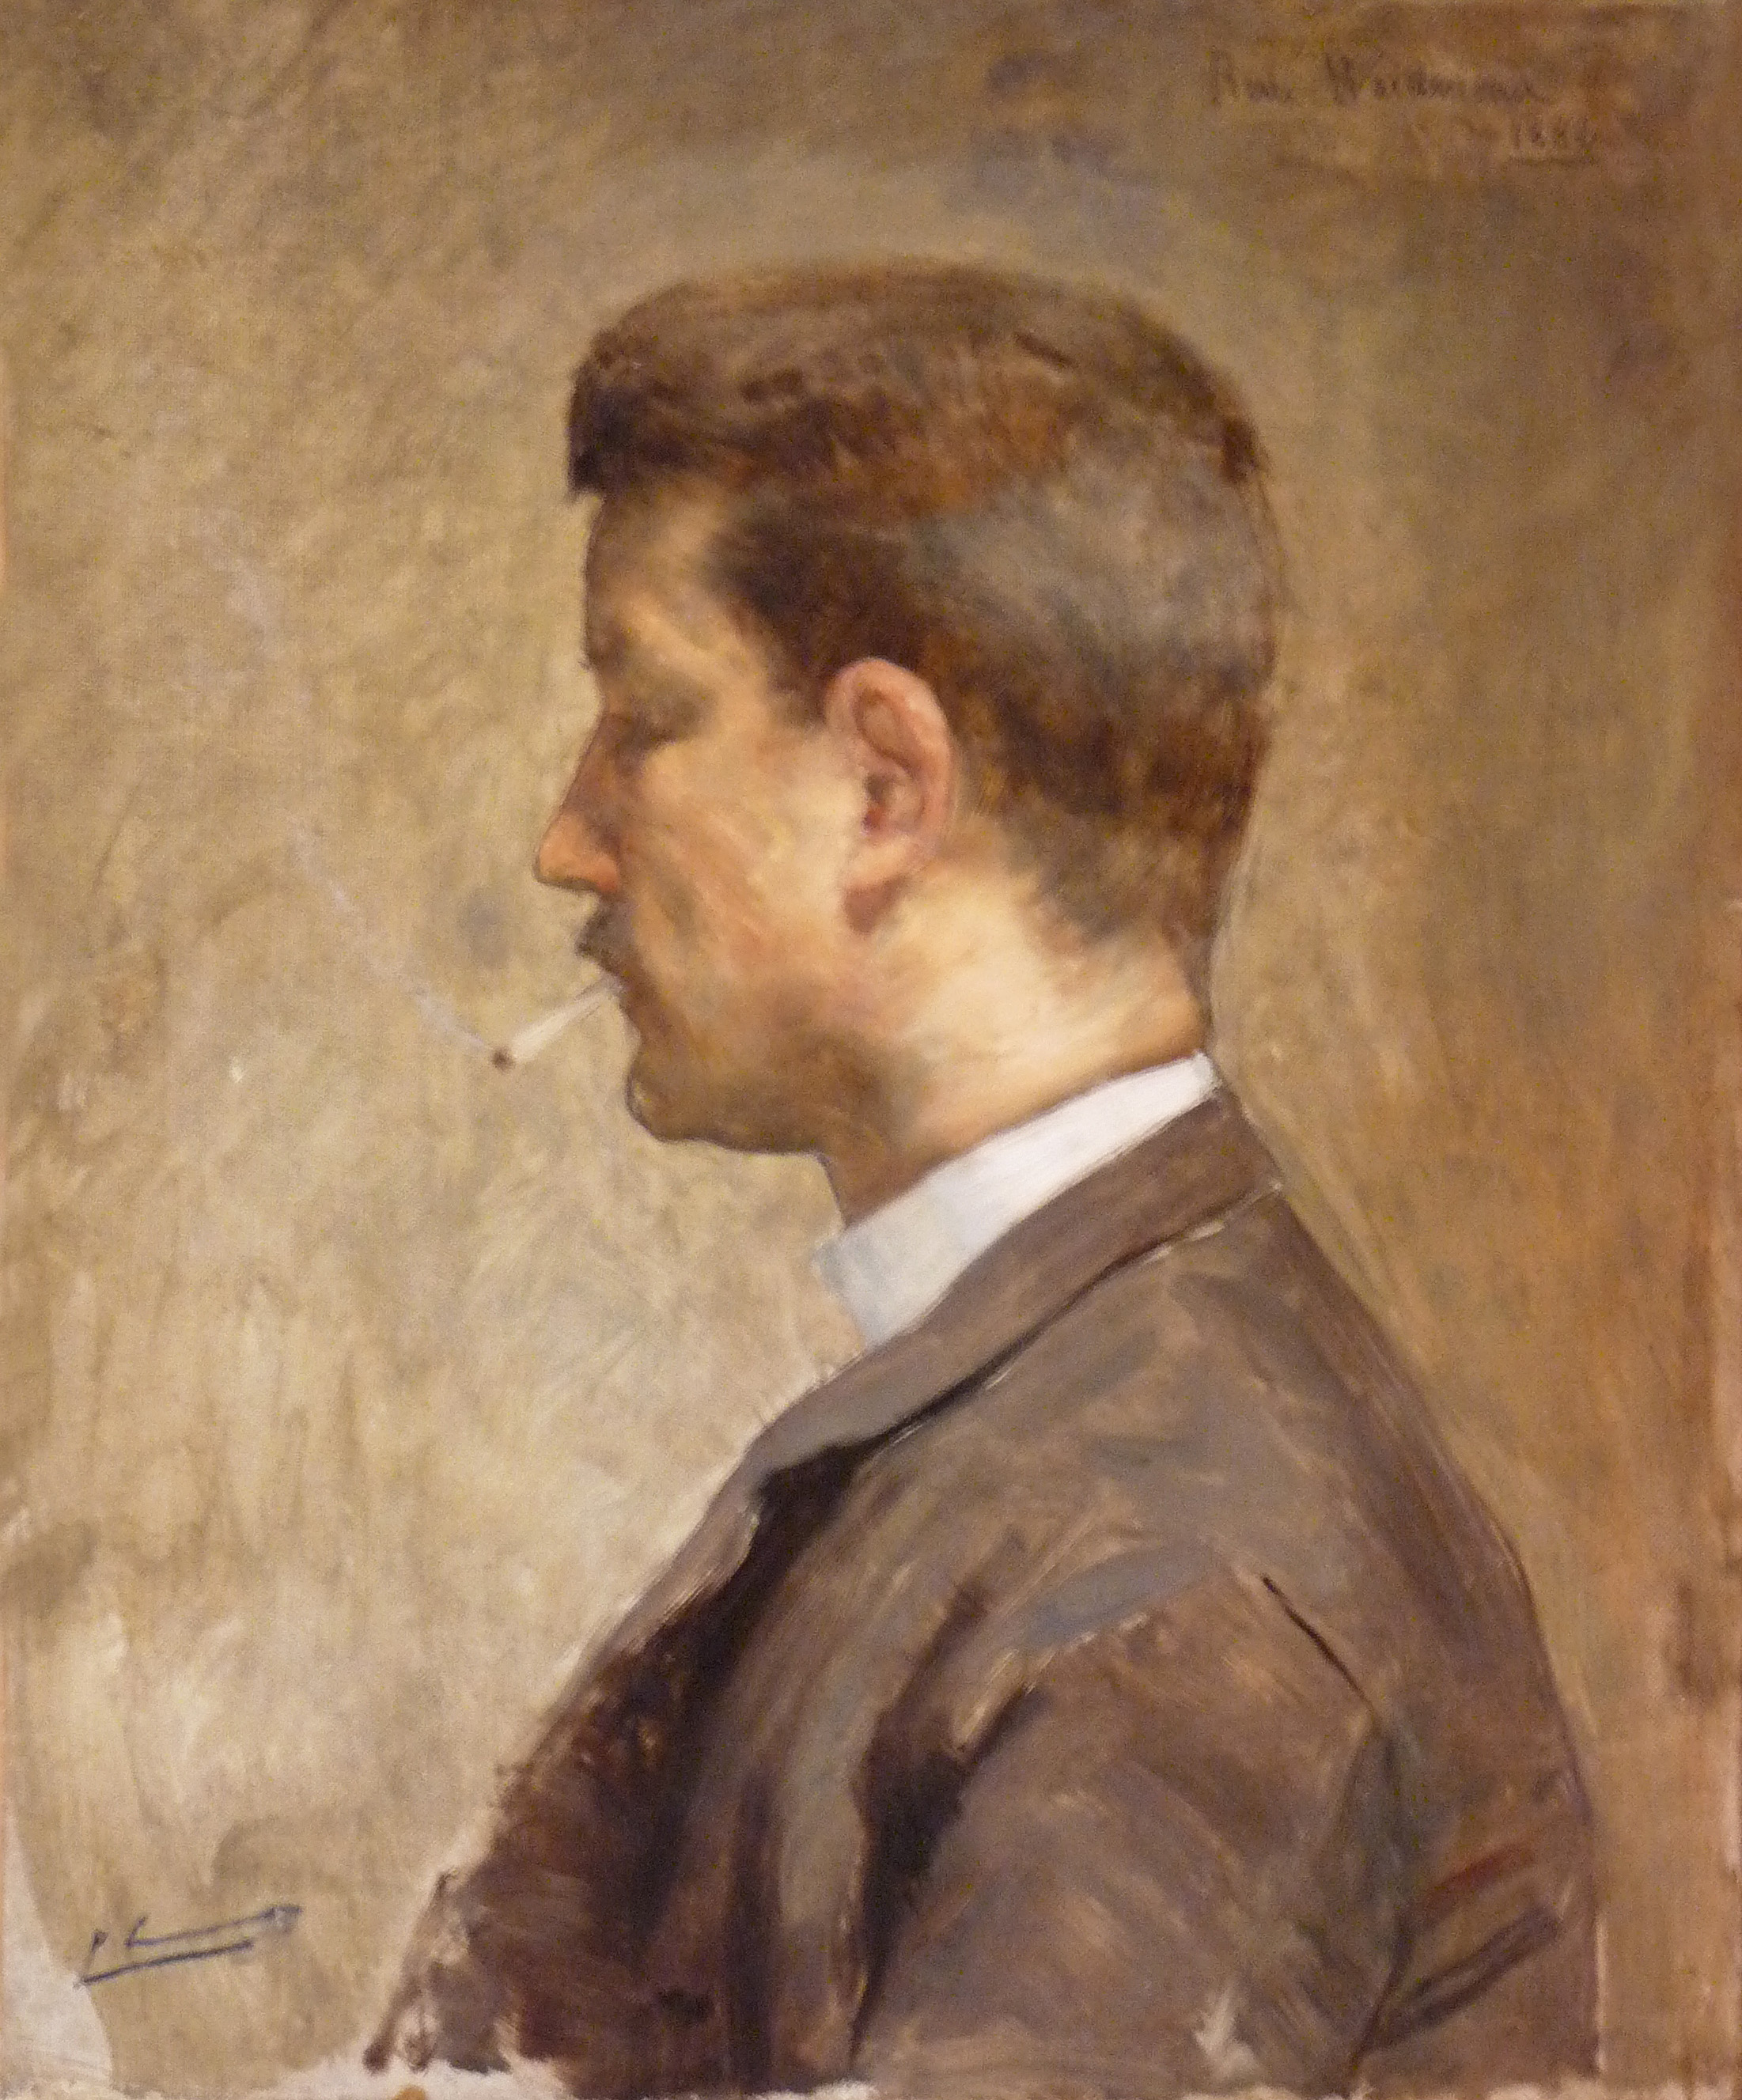 Image of Pierre Waidmann from Wikidata